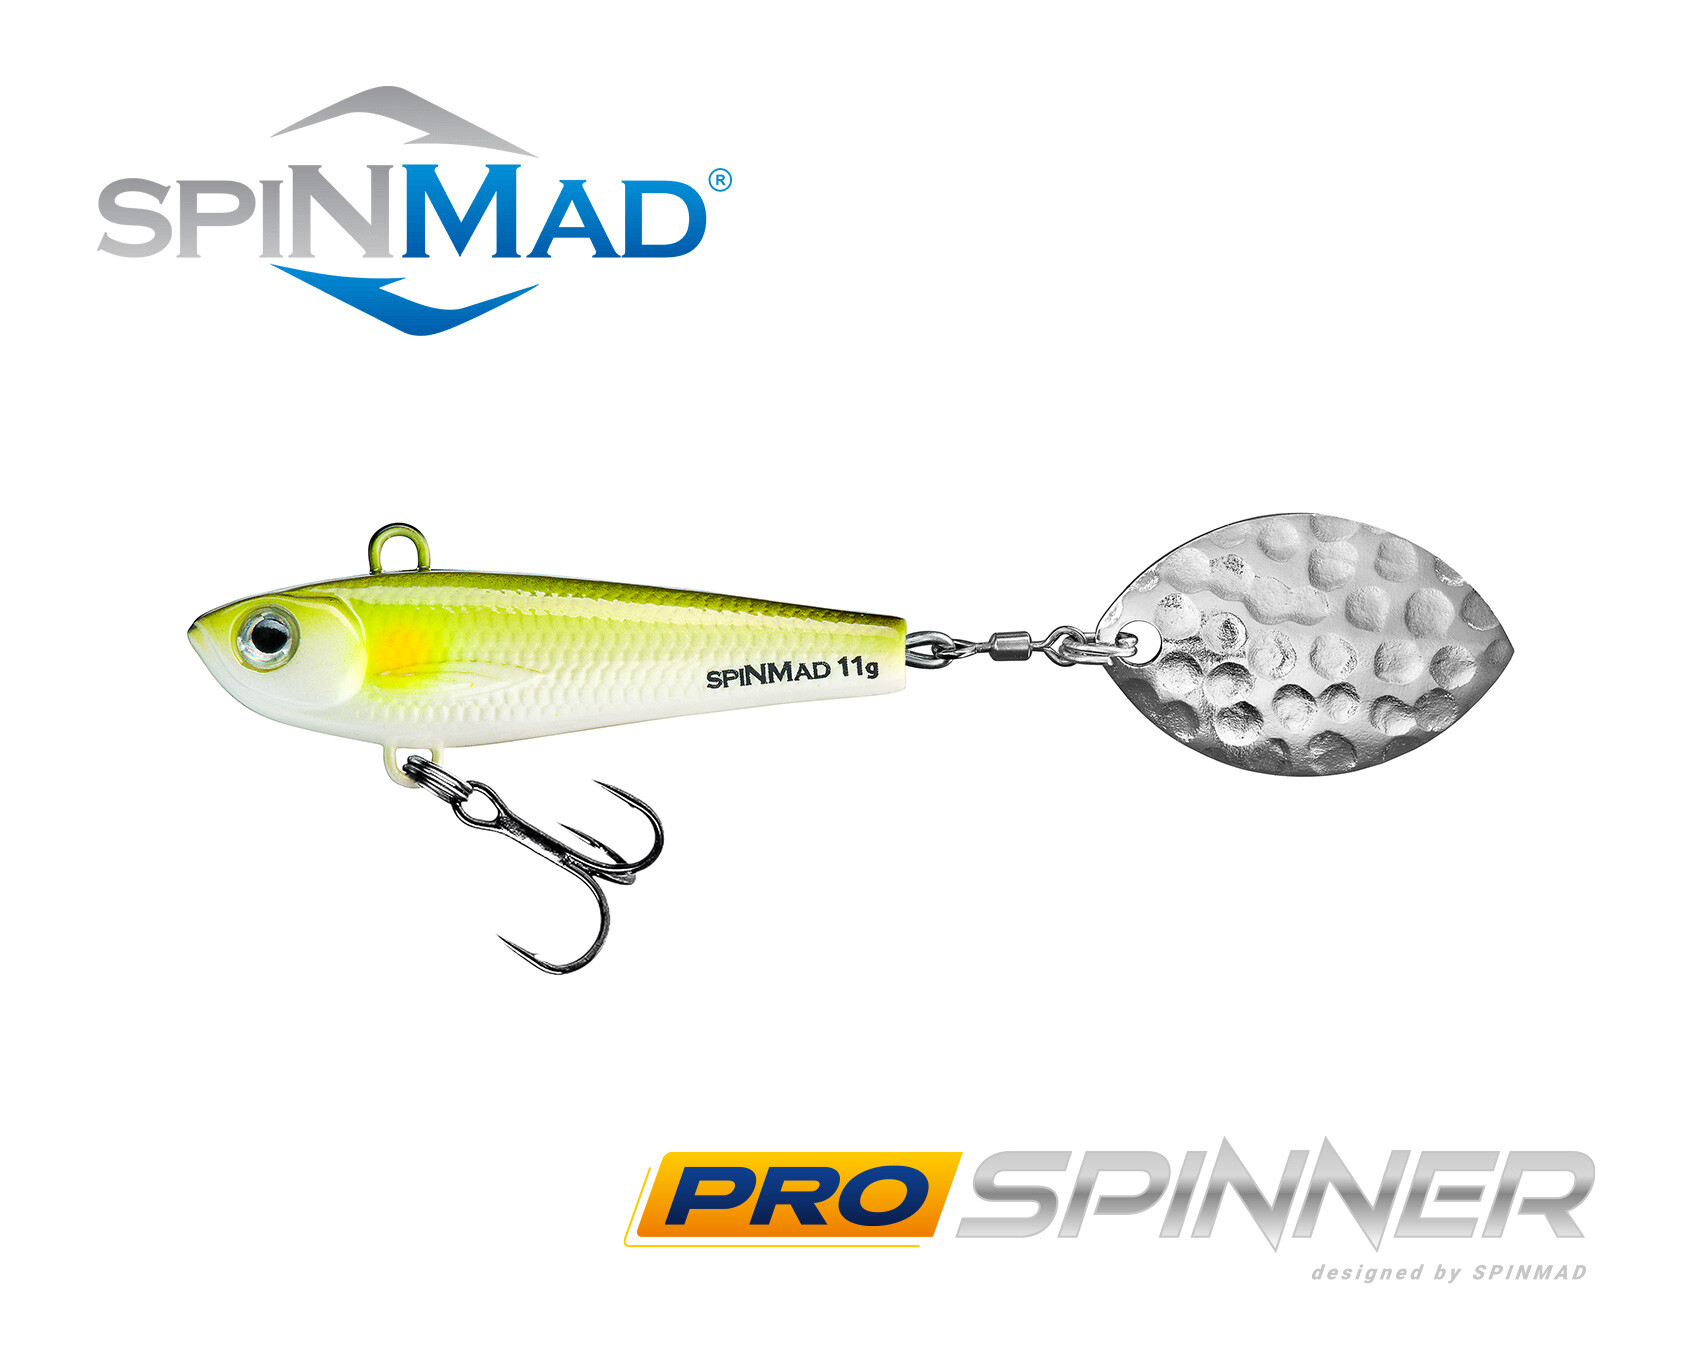 Spinmad Pro Spinner 11G Ayu